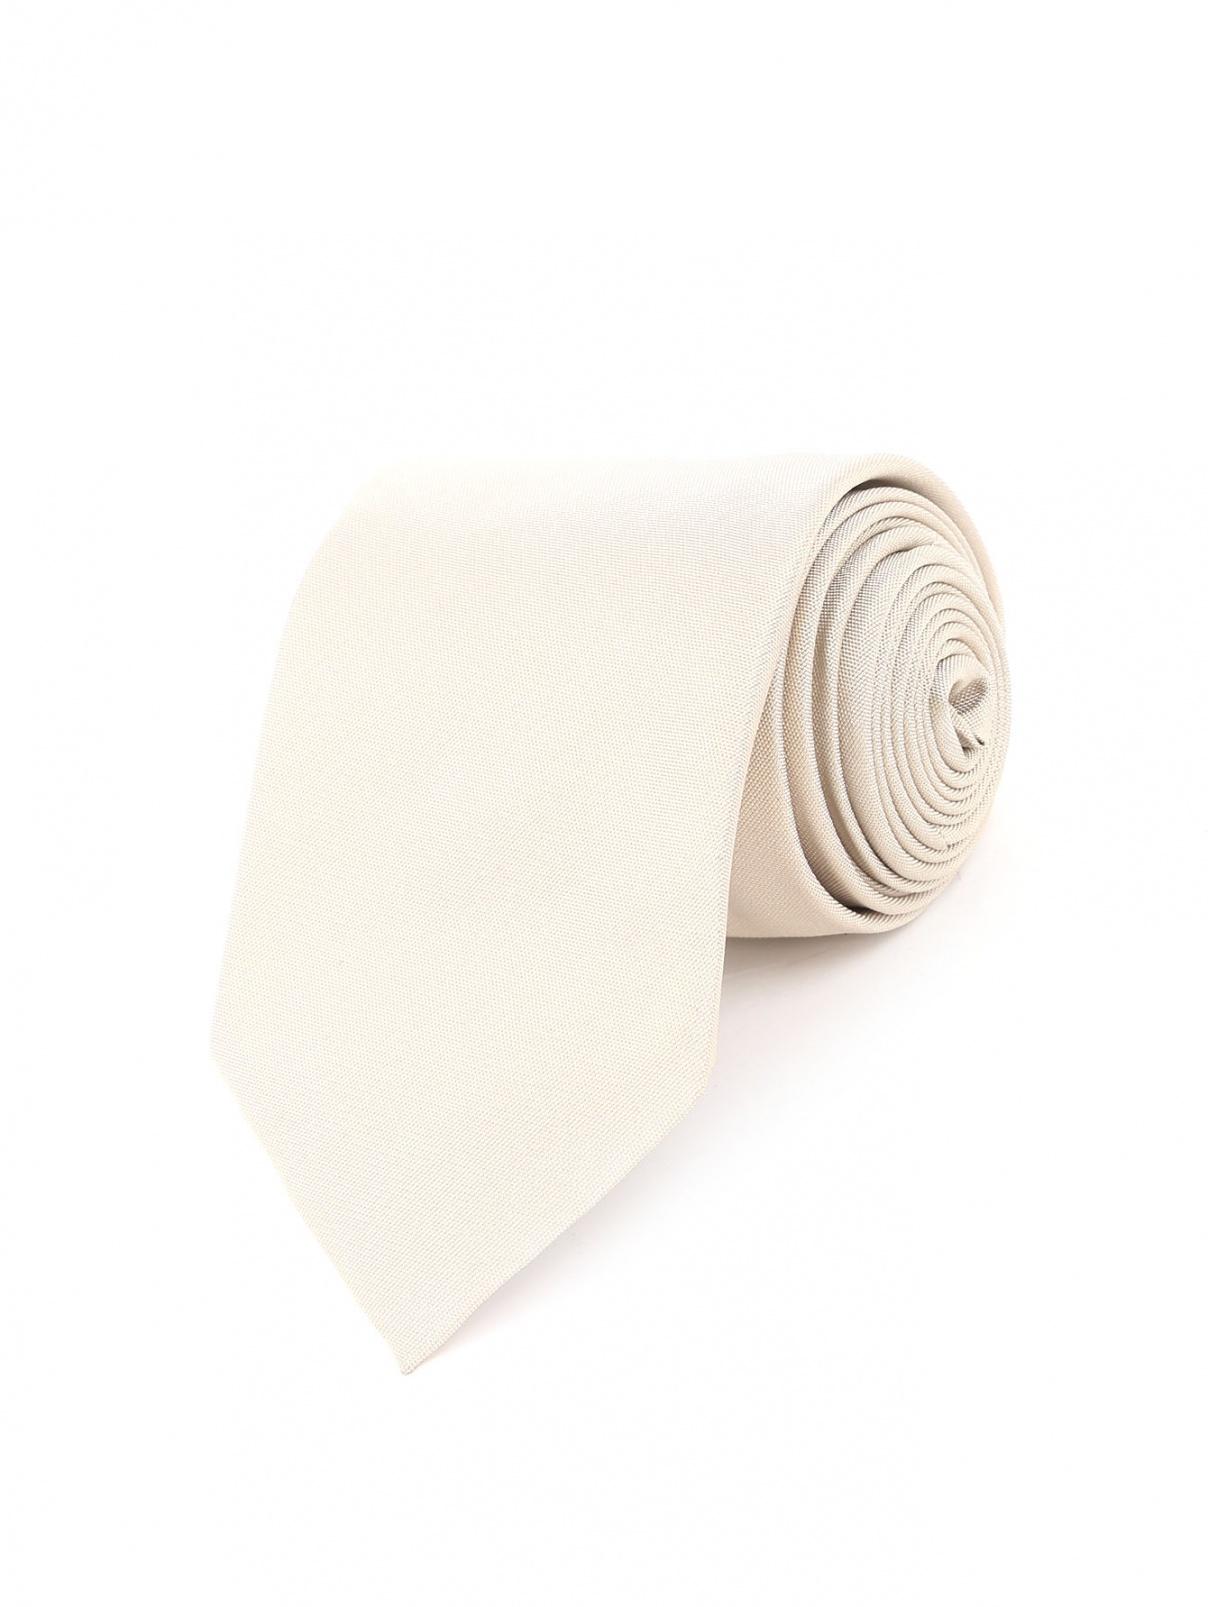 Галстук из шелка Boss  –  Общий вид  – Цвет:  Бежевый